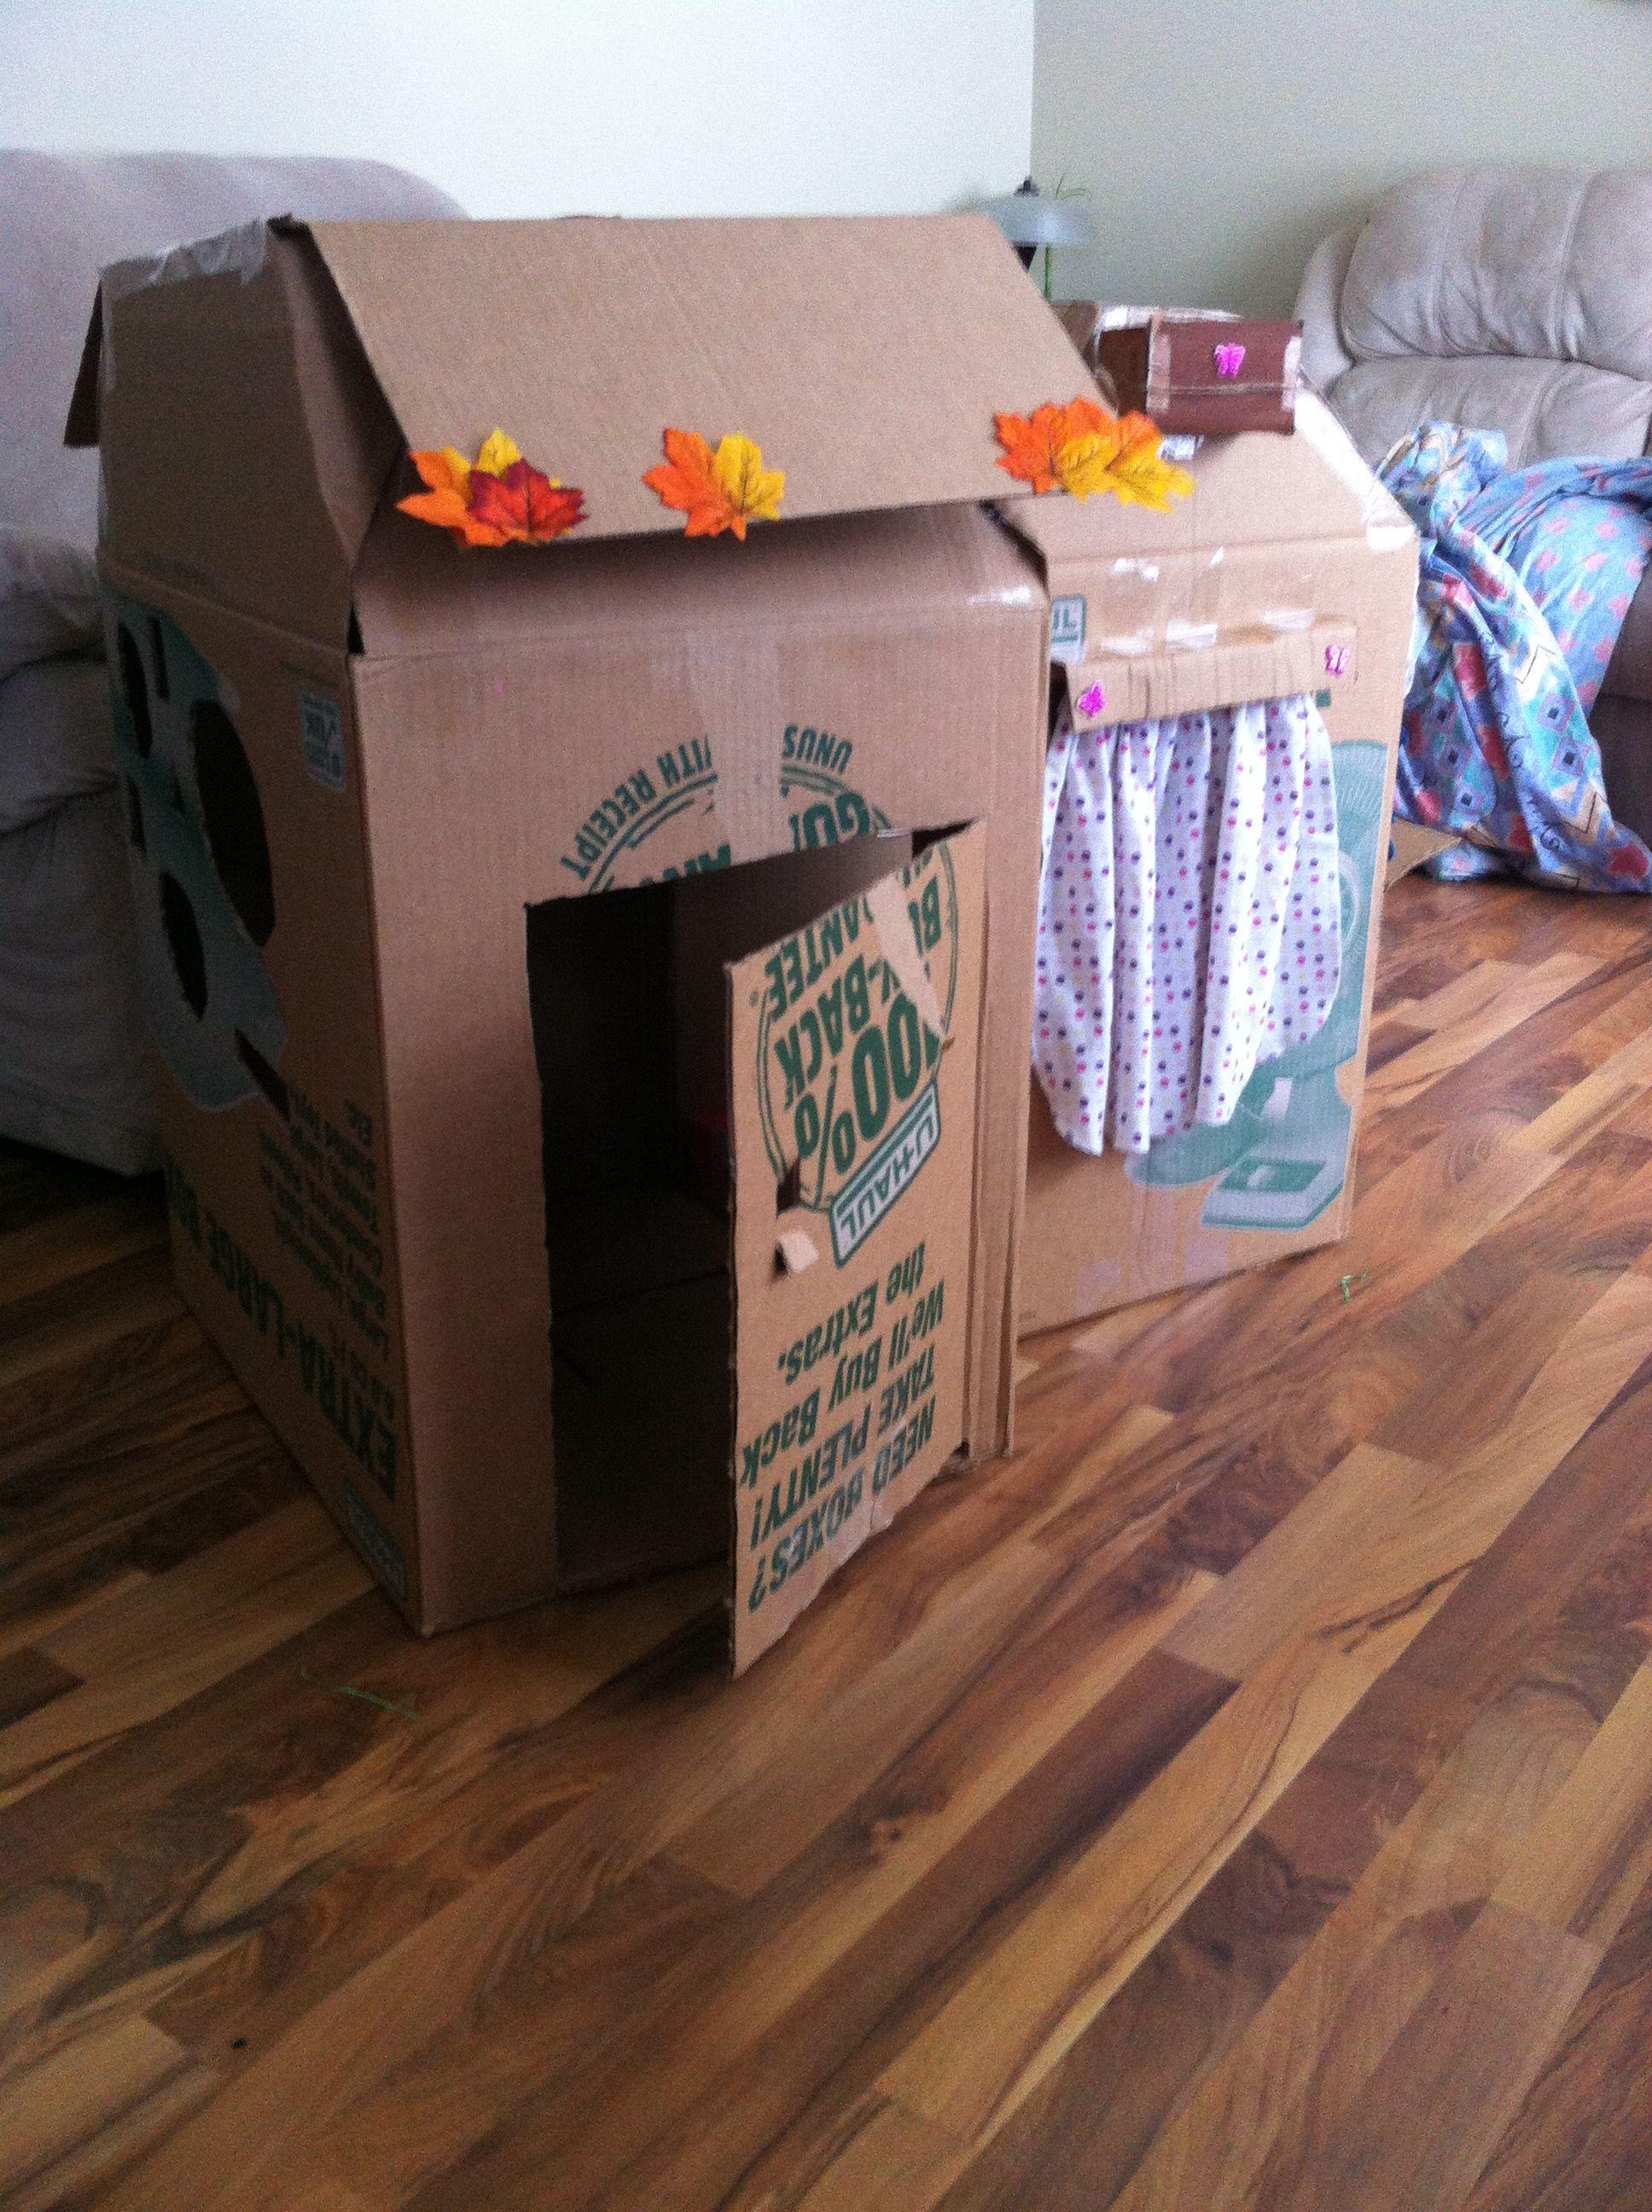 diy cardboard playhouse easy cheap fun for you're toddler